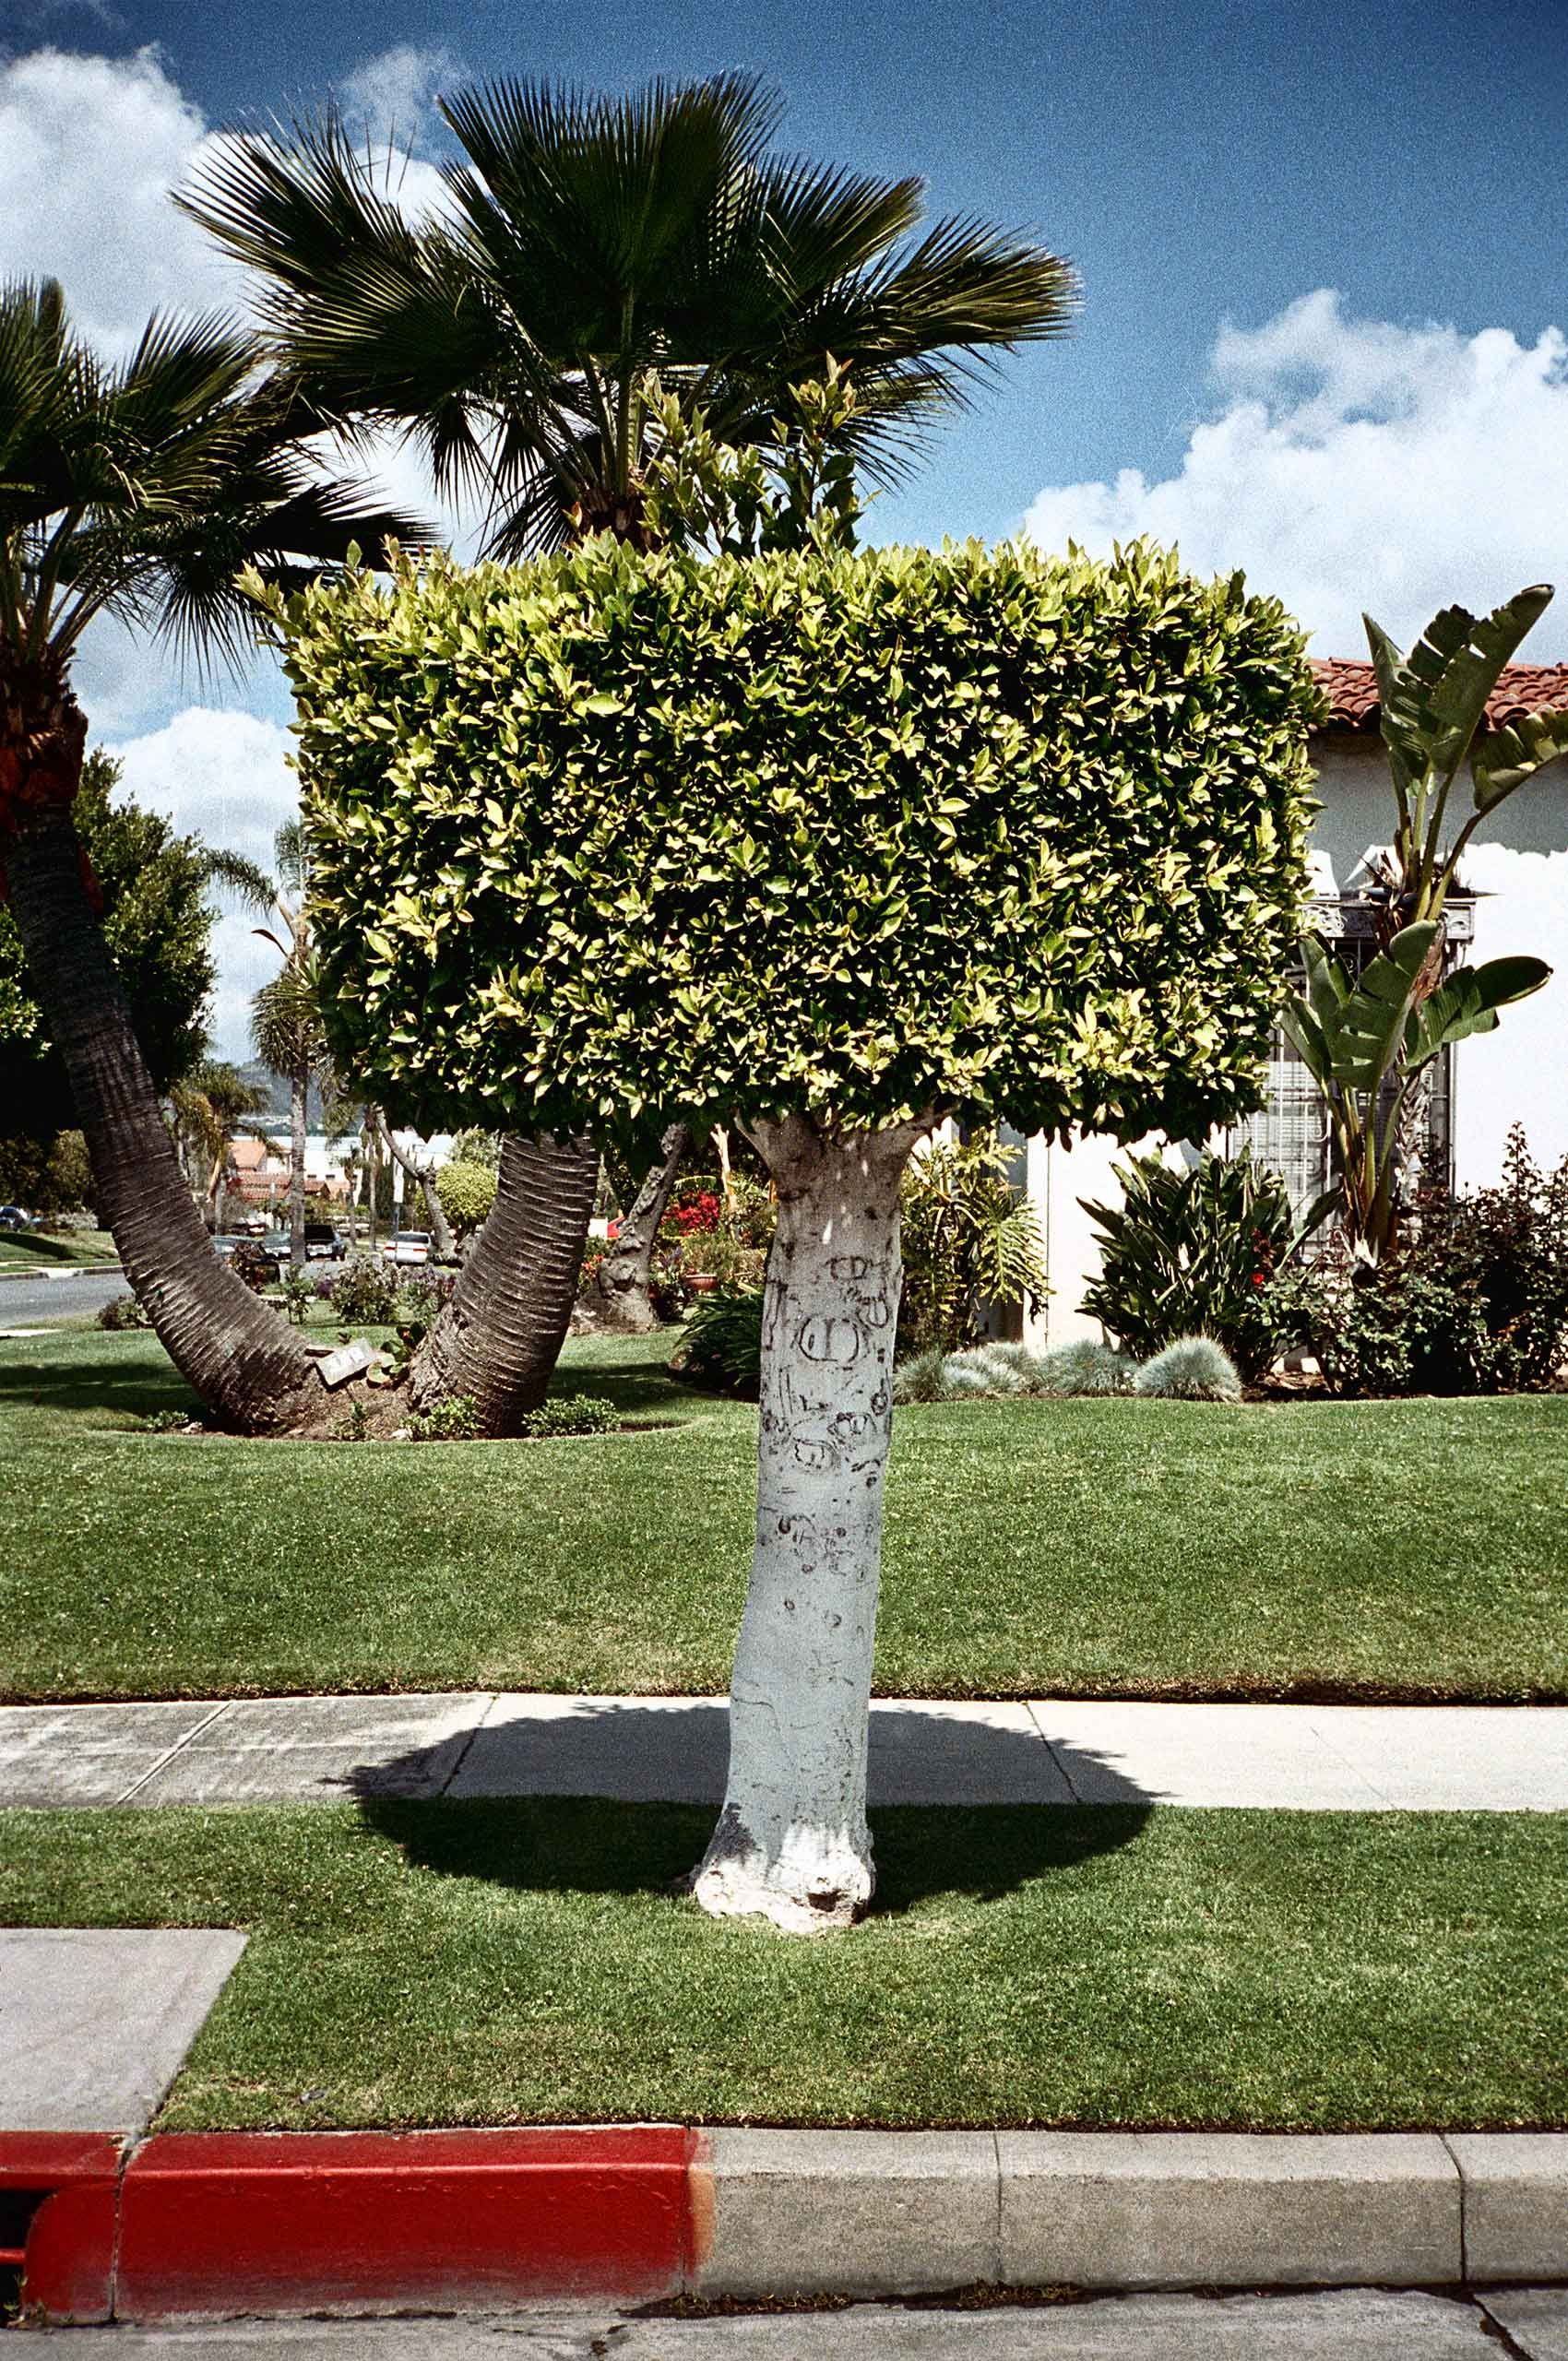 tree-losangeles-by-HenrikOlundPhotography.jpg